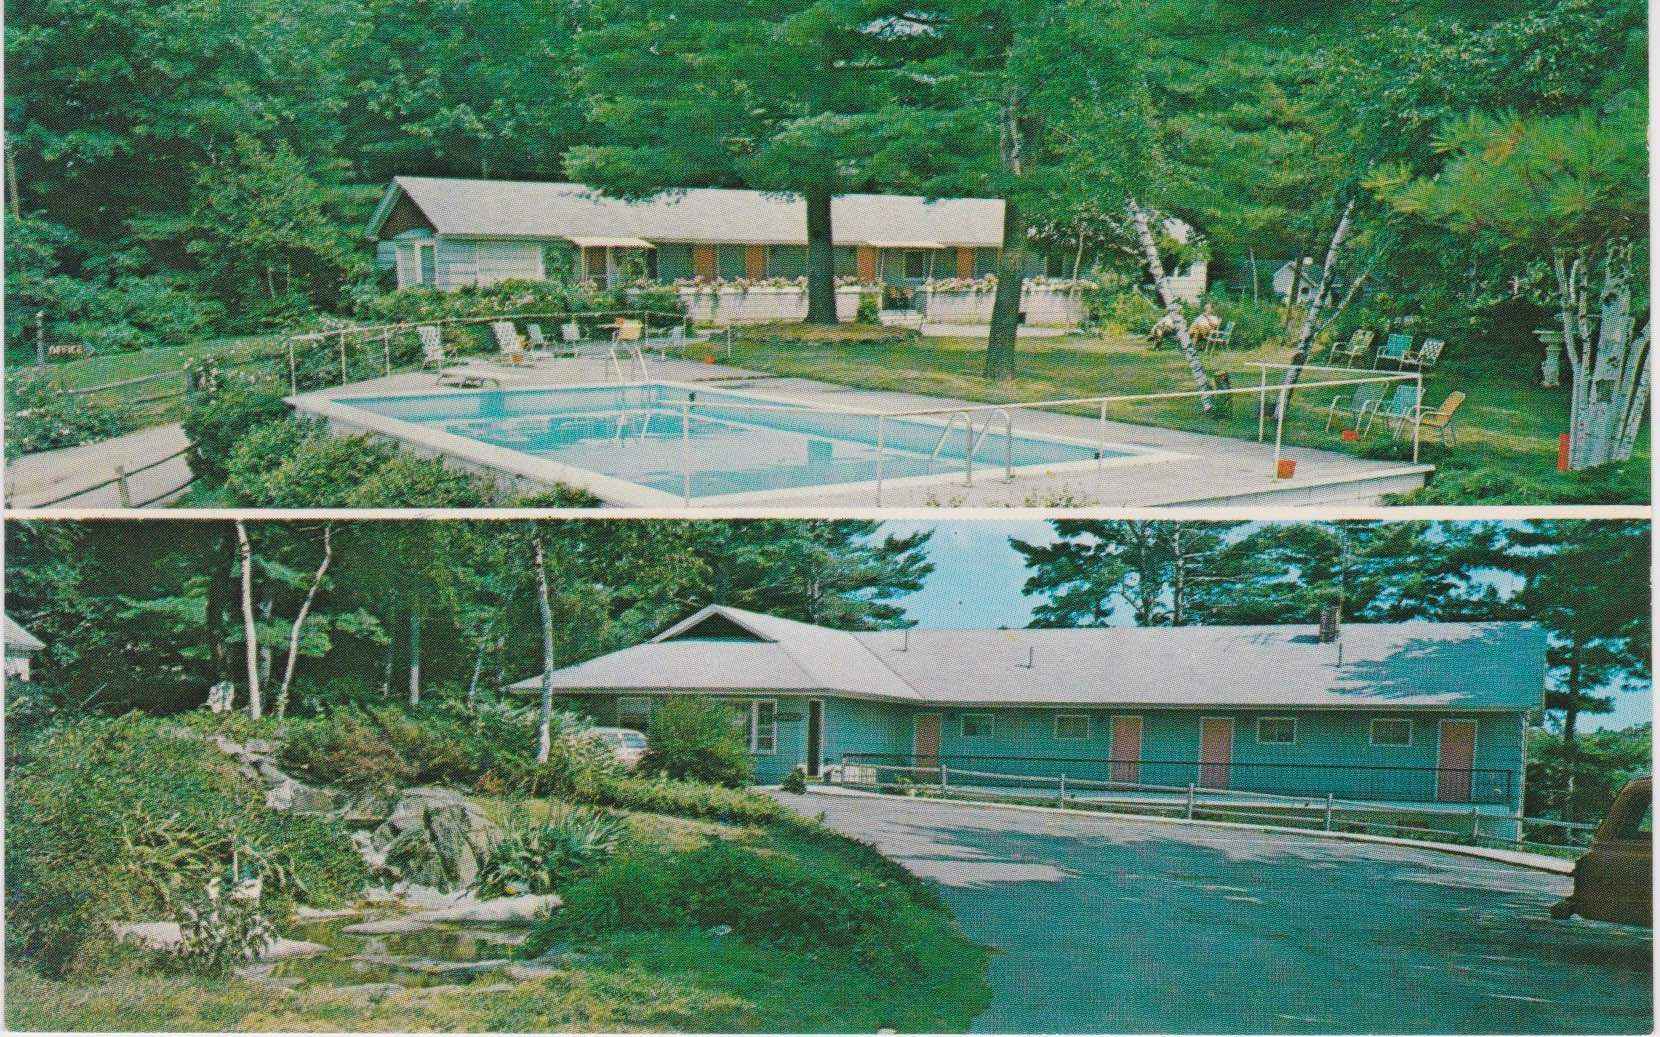 Blue Roof Motel Postcard